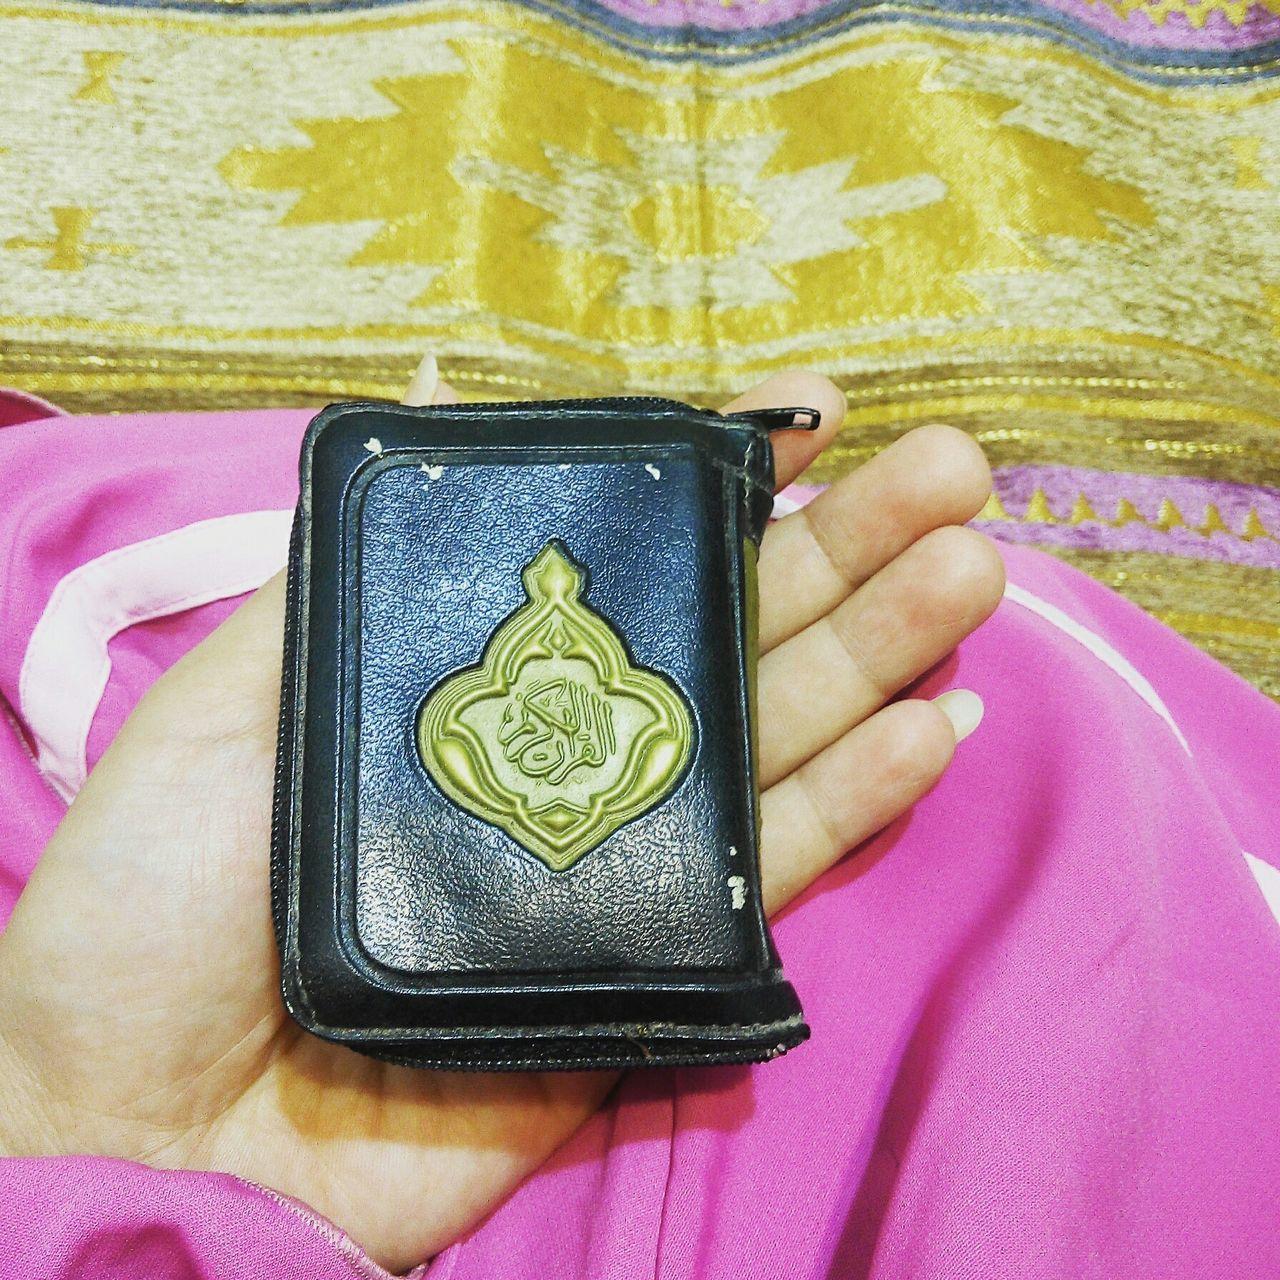 Al-quran the answers of all questions in the worlds AlQuran Myalquraan I Am A Muslim Muslim